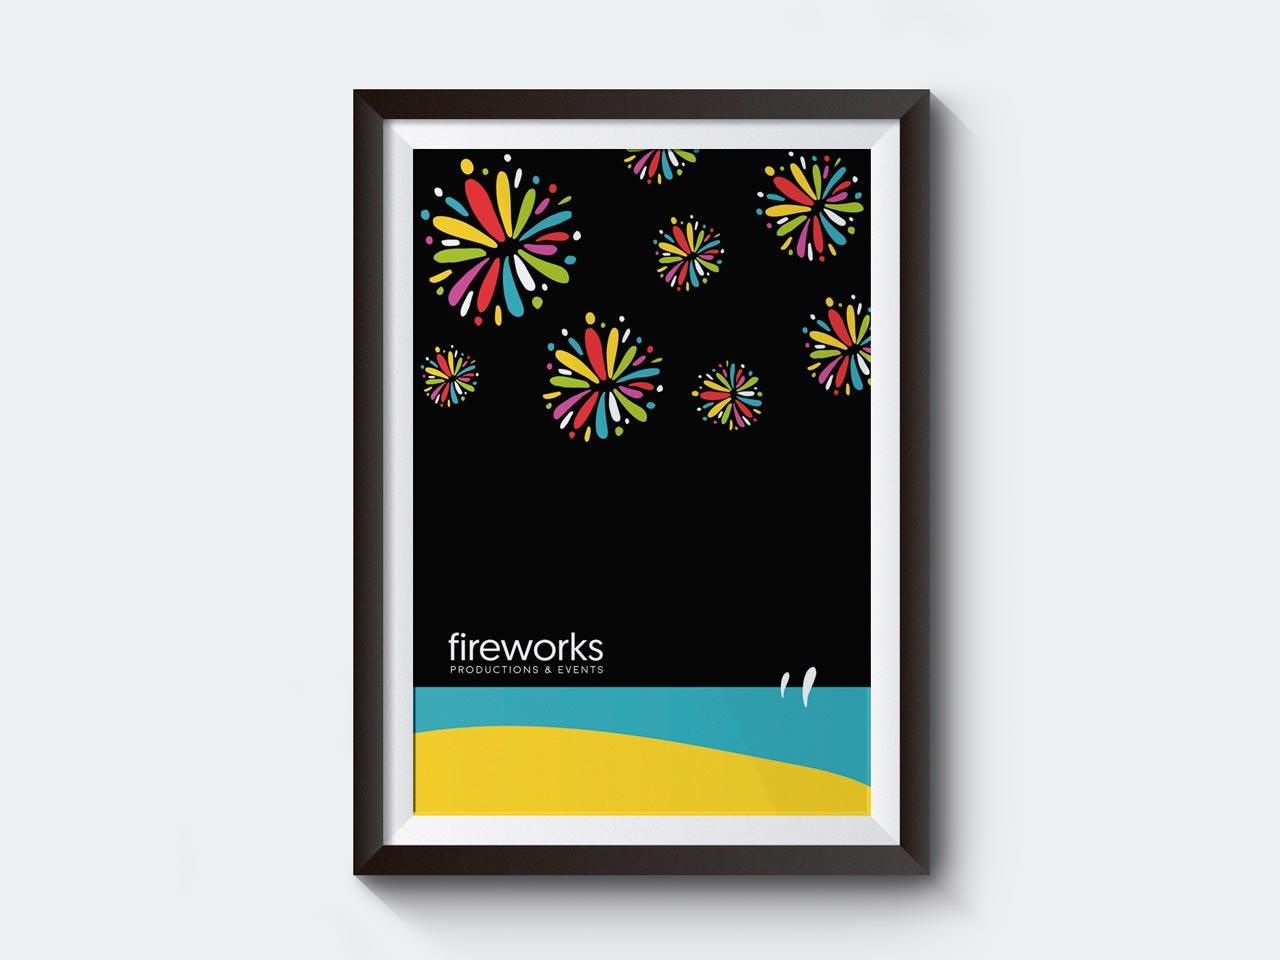 cartel Fireworks por Siroco